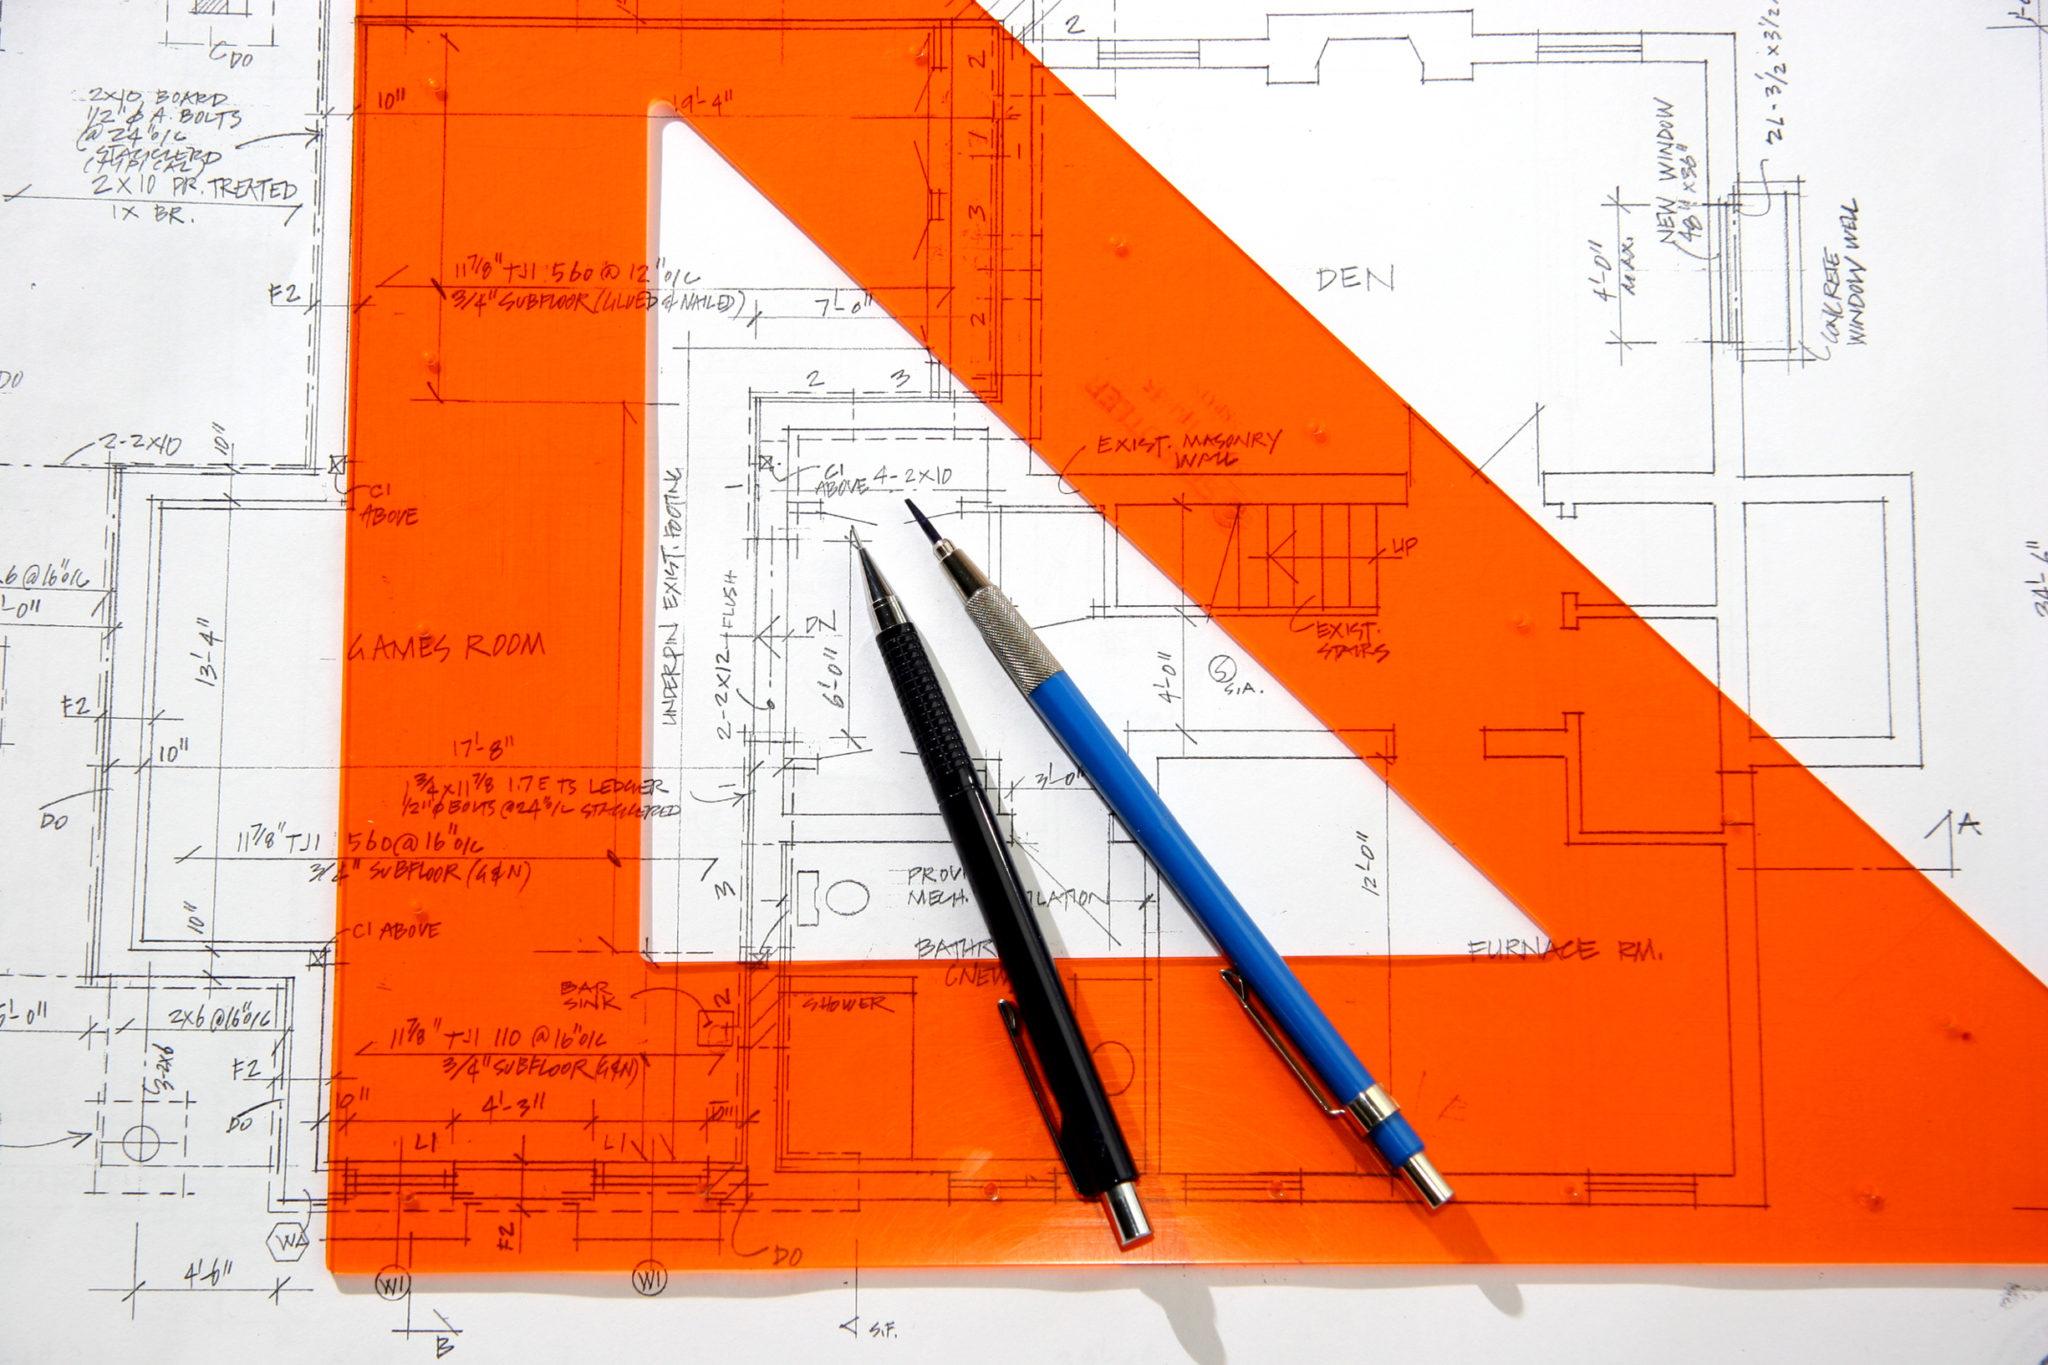 REI_architecture_plan